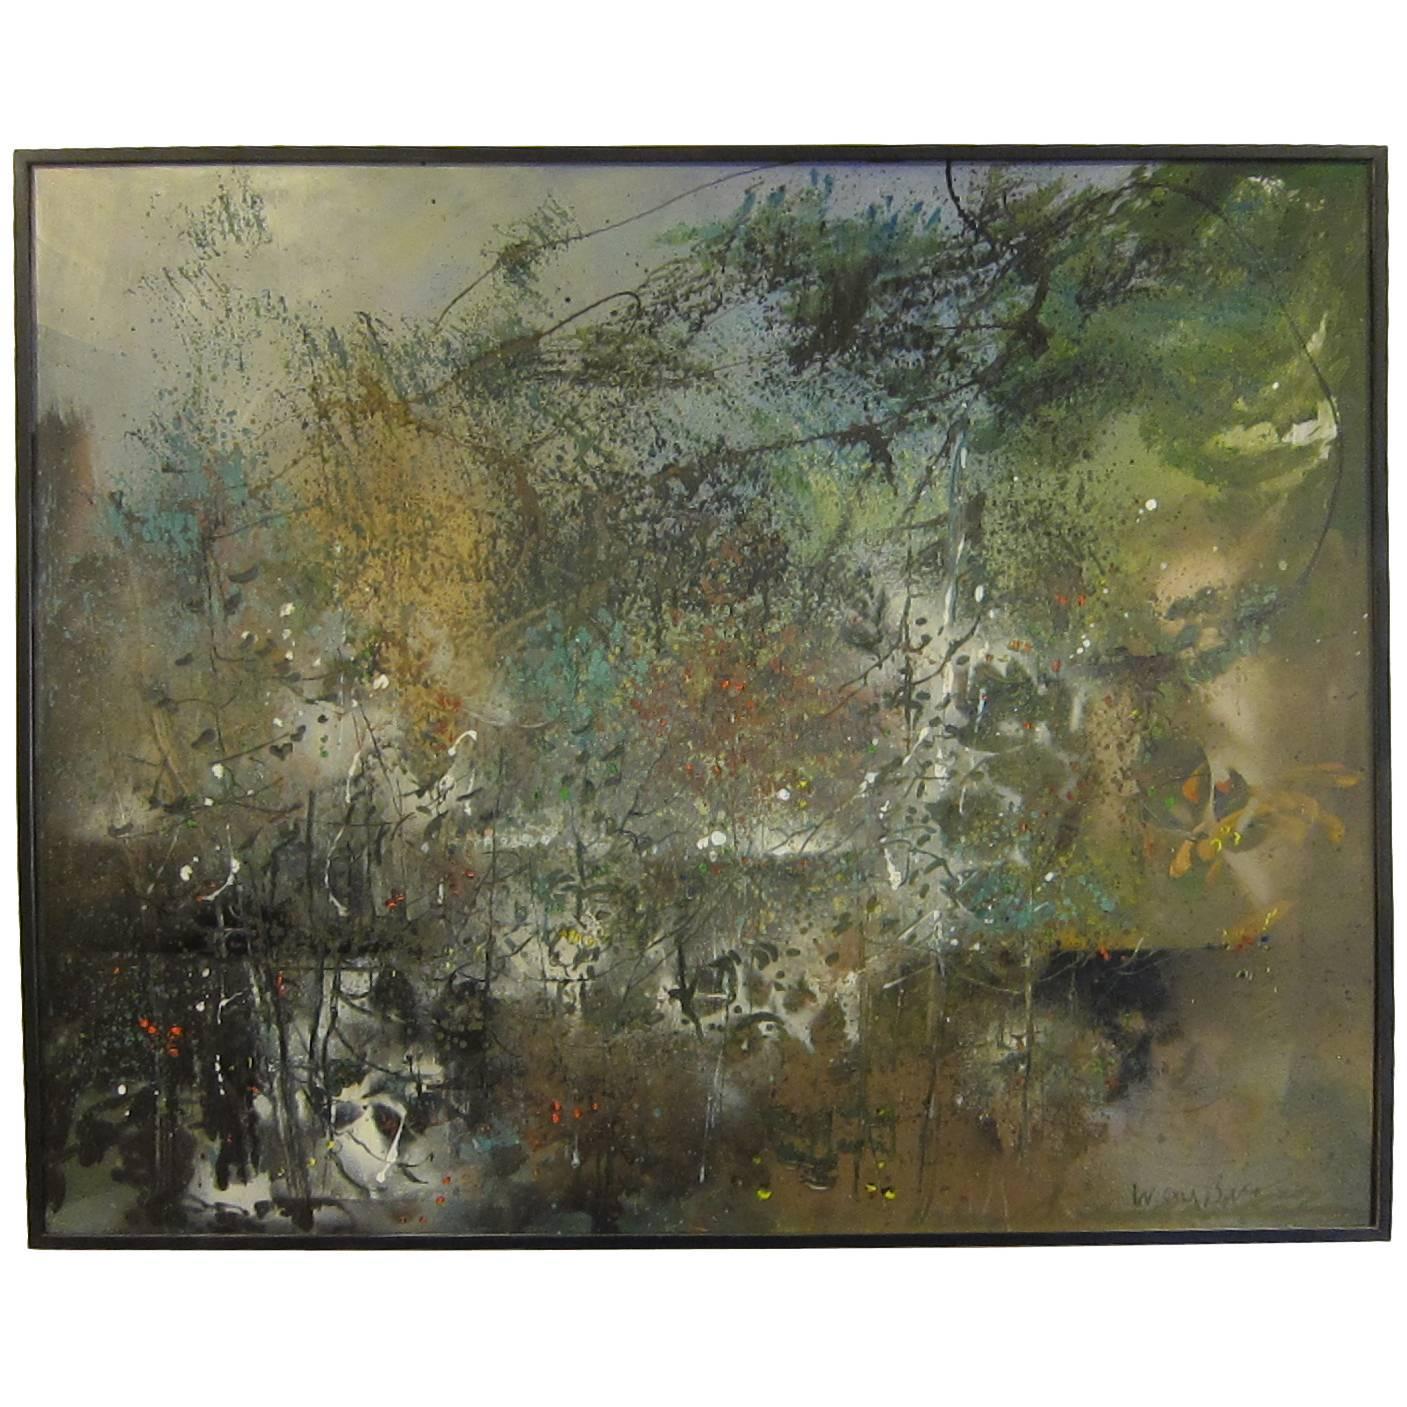 W. Carl Burger Oil on Canvas